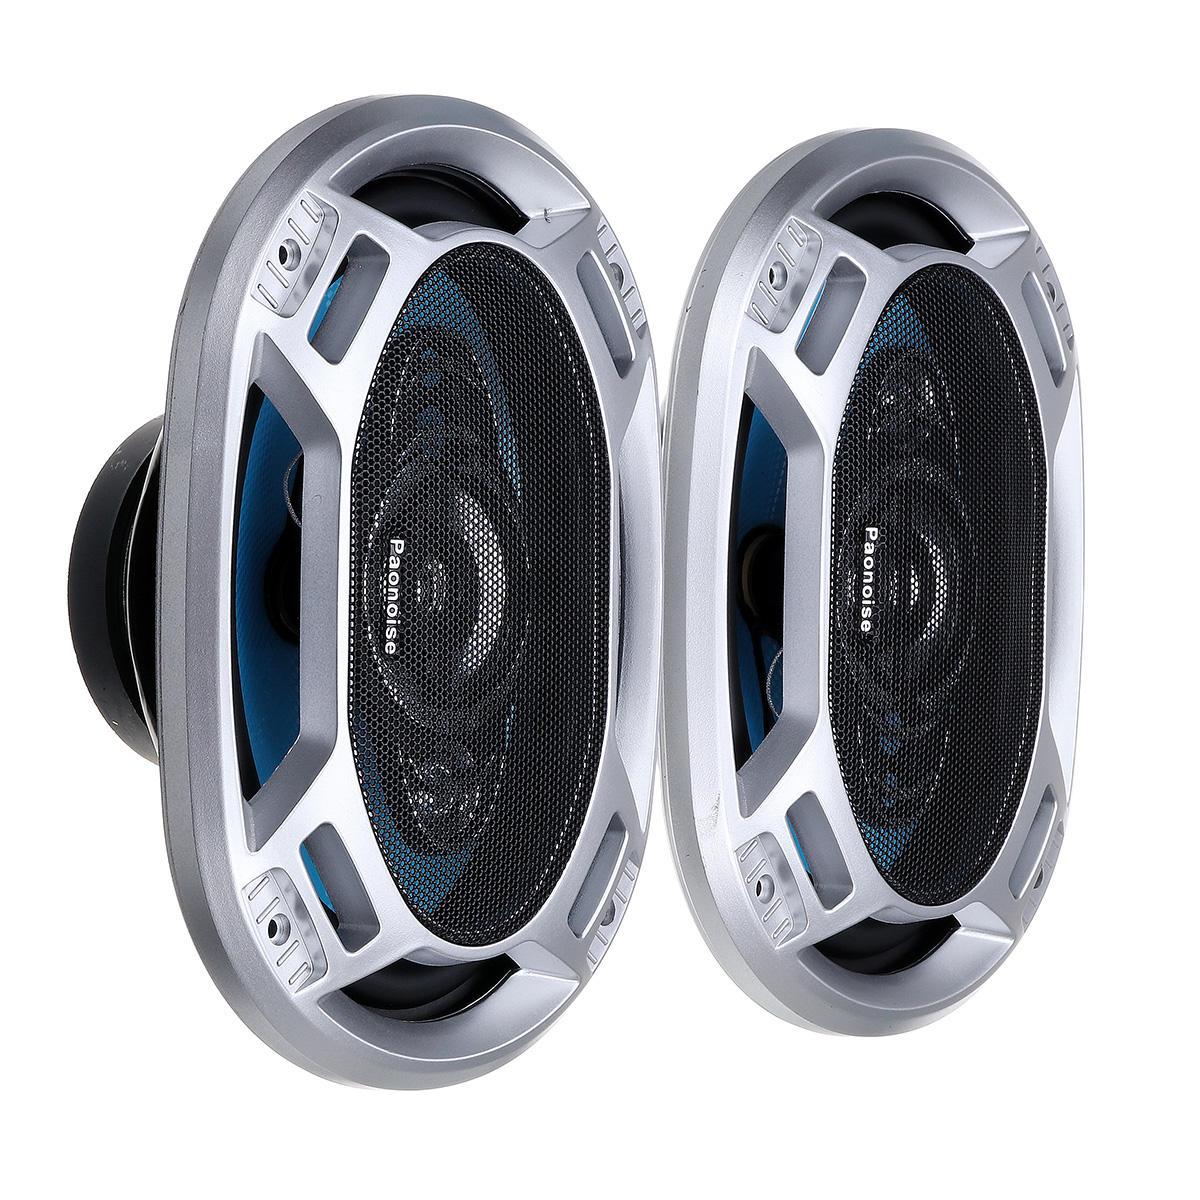 YQ-6908P 1000W 6x9 Pair Of Component Car Speaker Ring